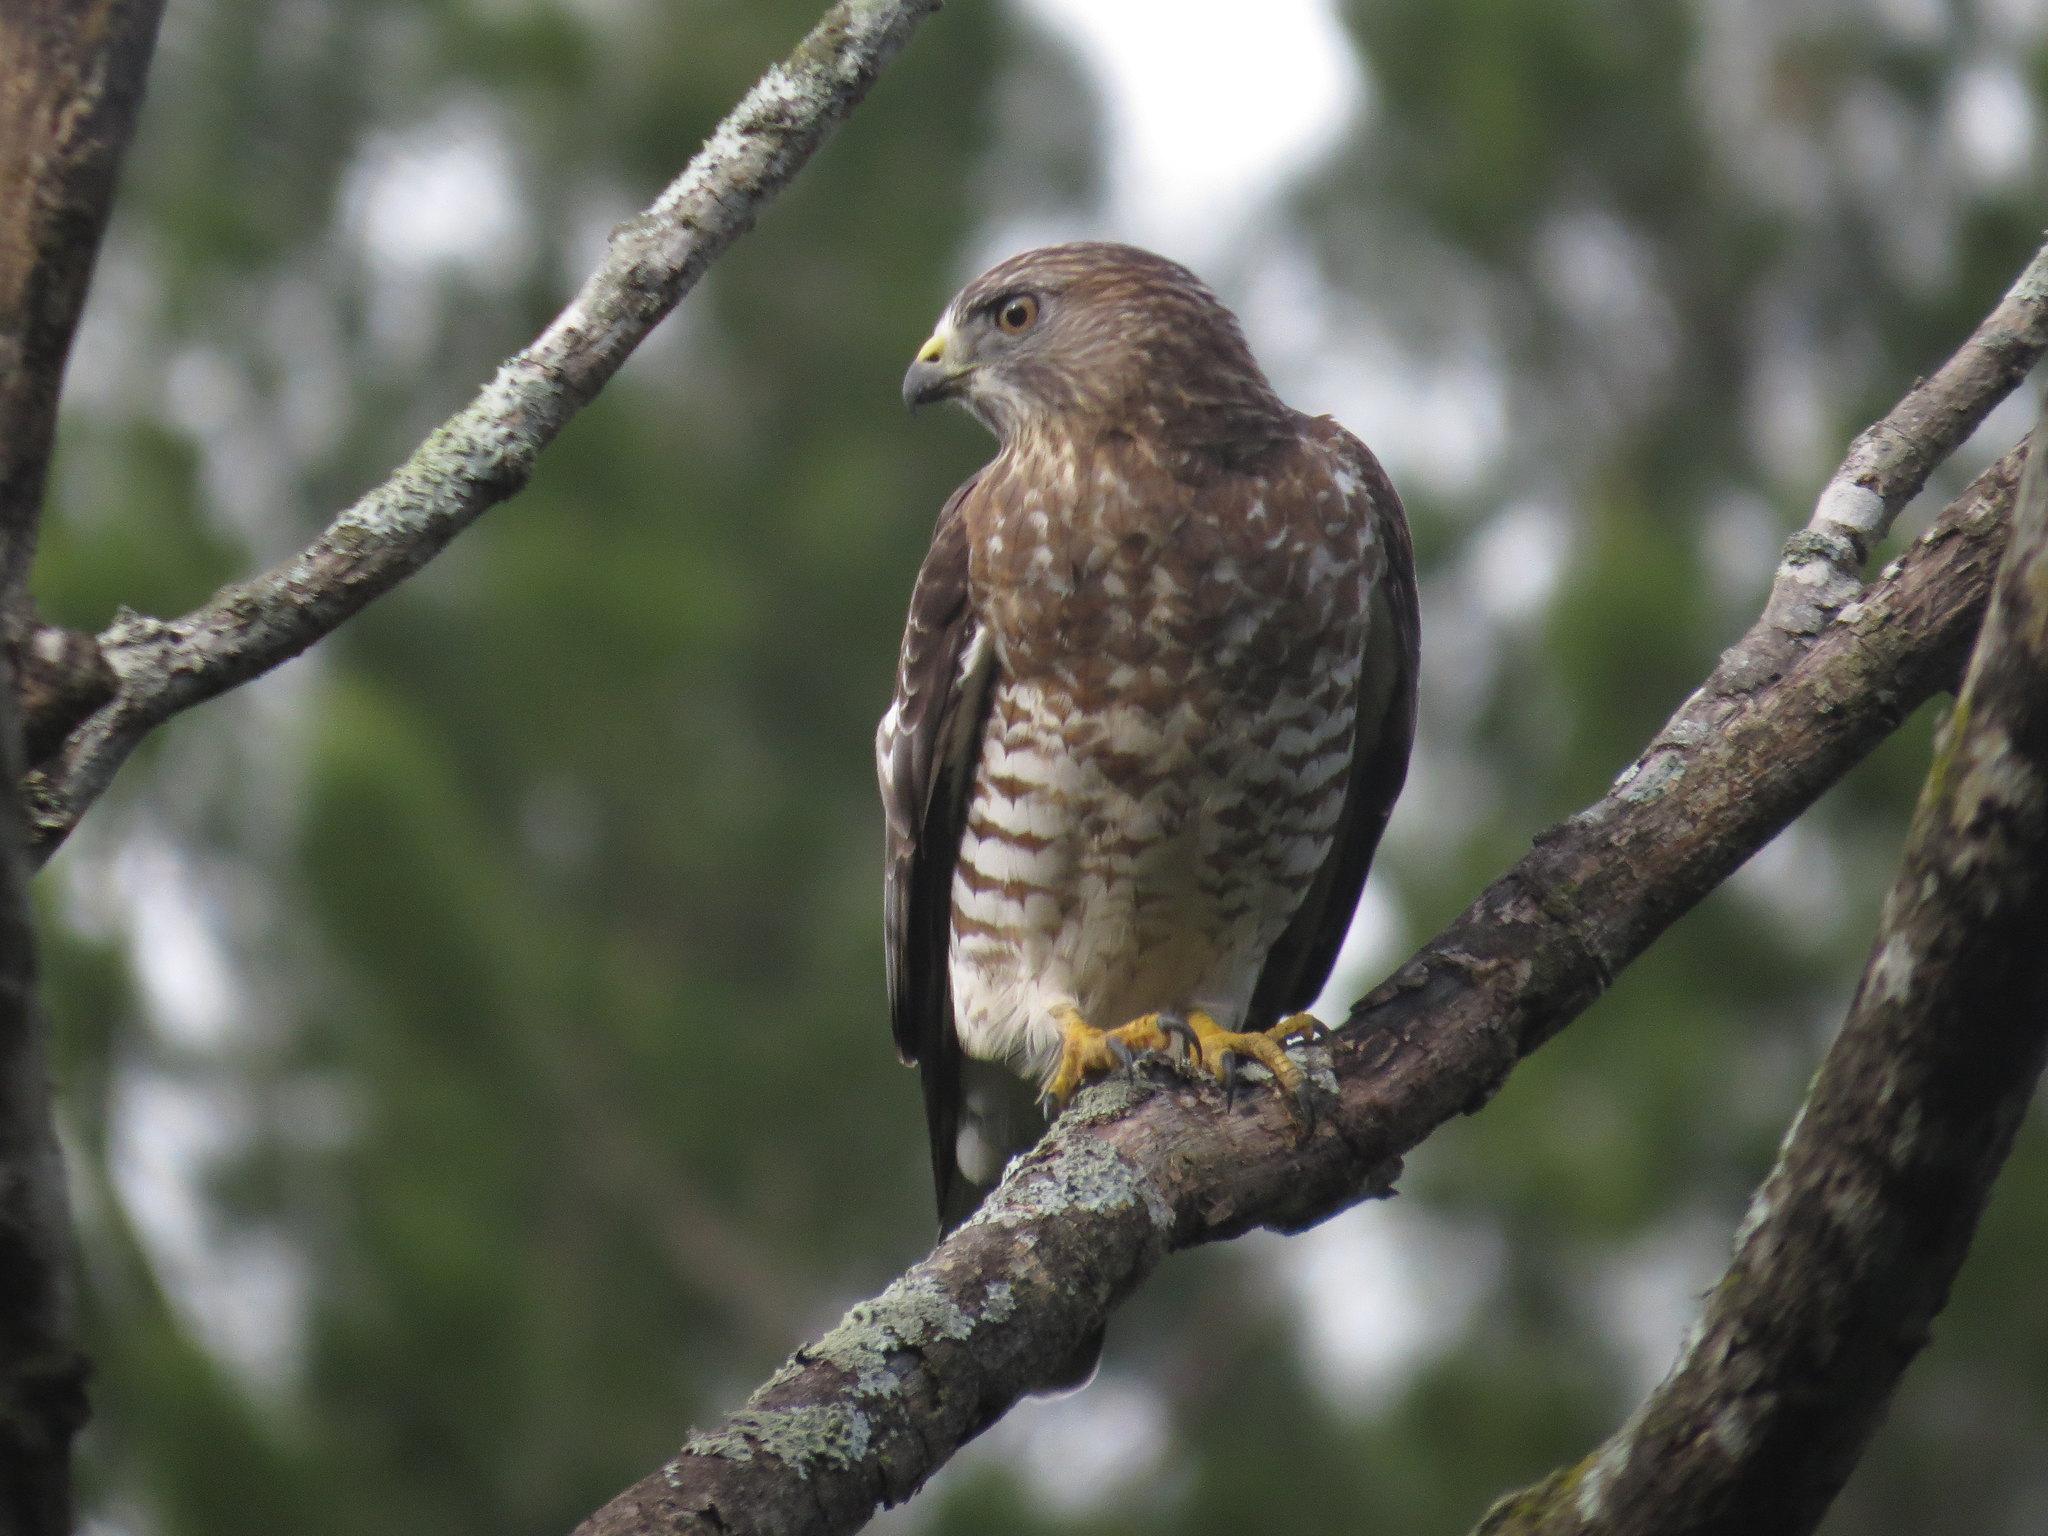 Broad-winged Hawk by Seth Inman - La Paz Group